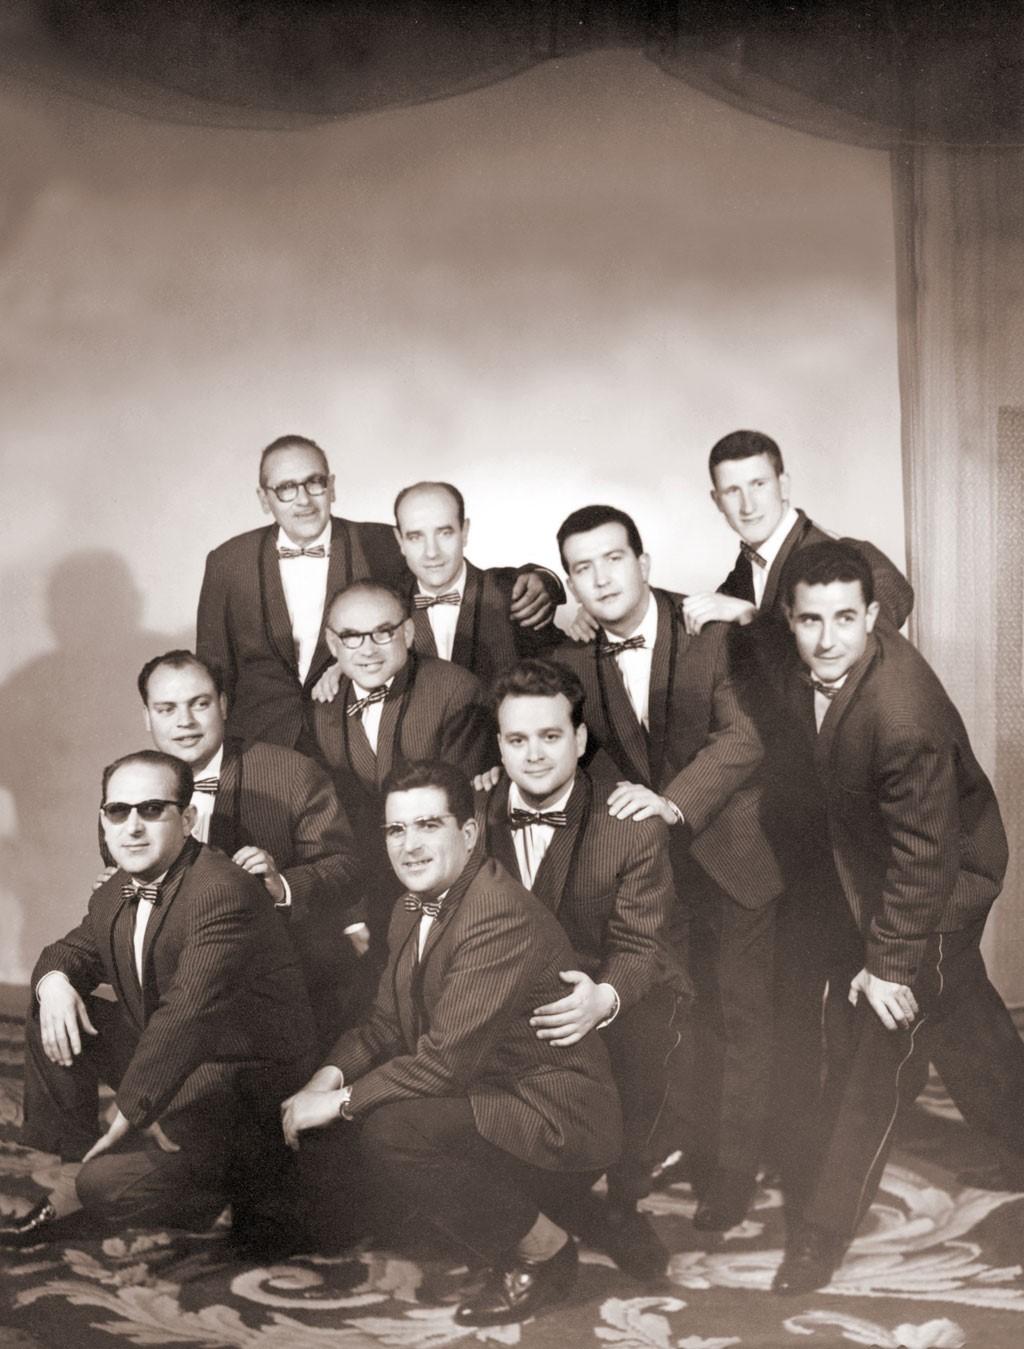 La Orquesta Ritmo (1963). D. Rafael Calonge en el centro (Fuente: Fototeca Municipal Campo de Criptana).